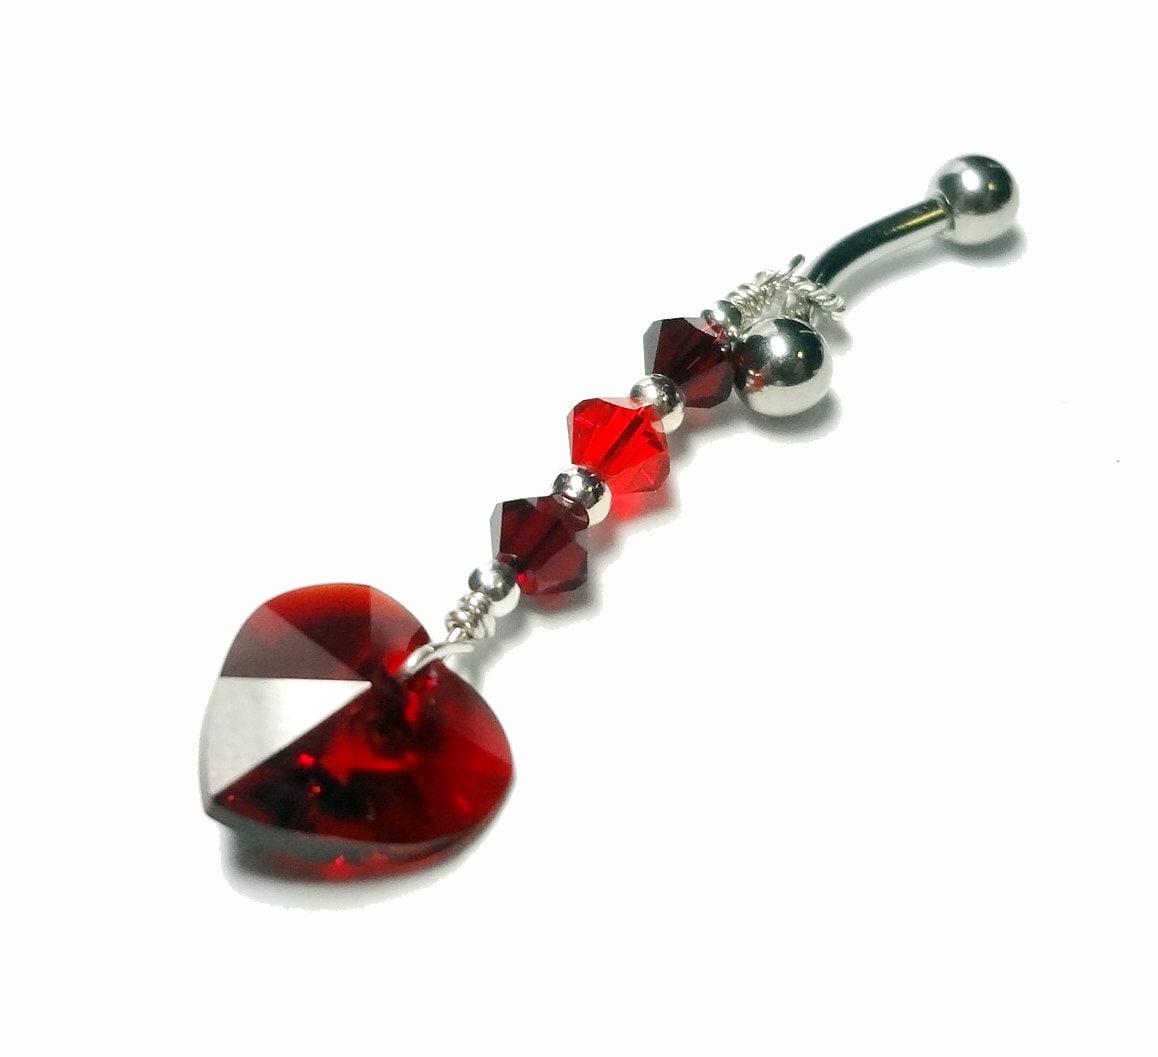 Heart VCH Piercing VCH Jewelry Belly Ring Intimate Body